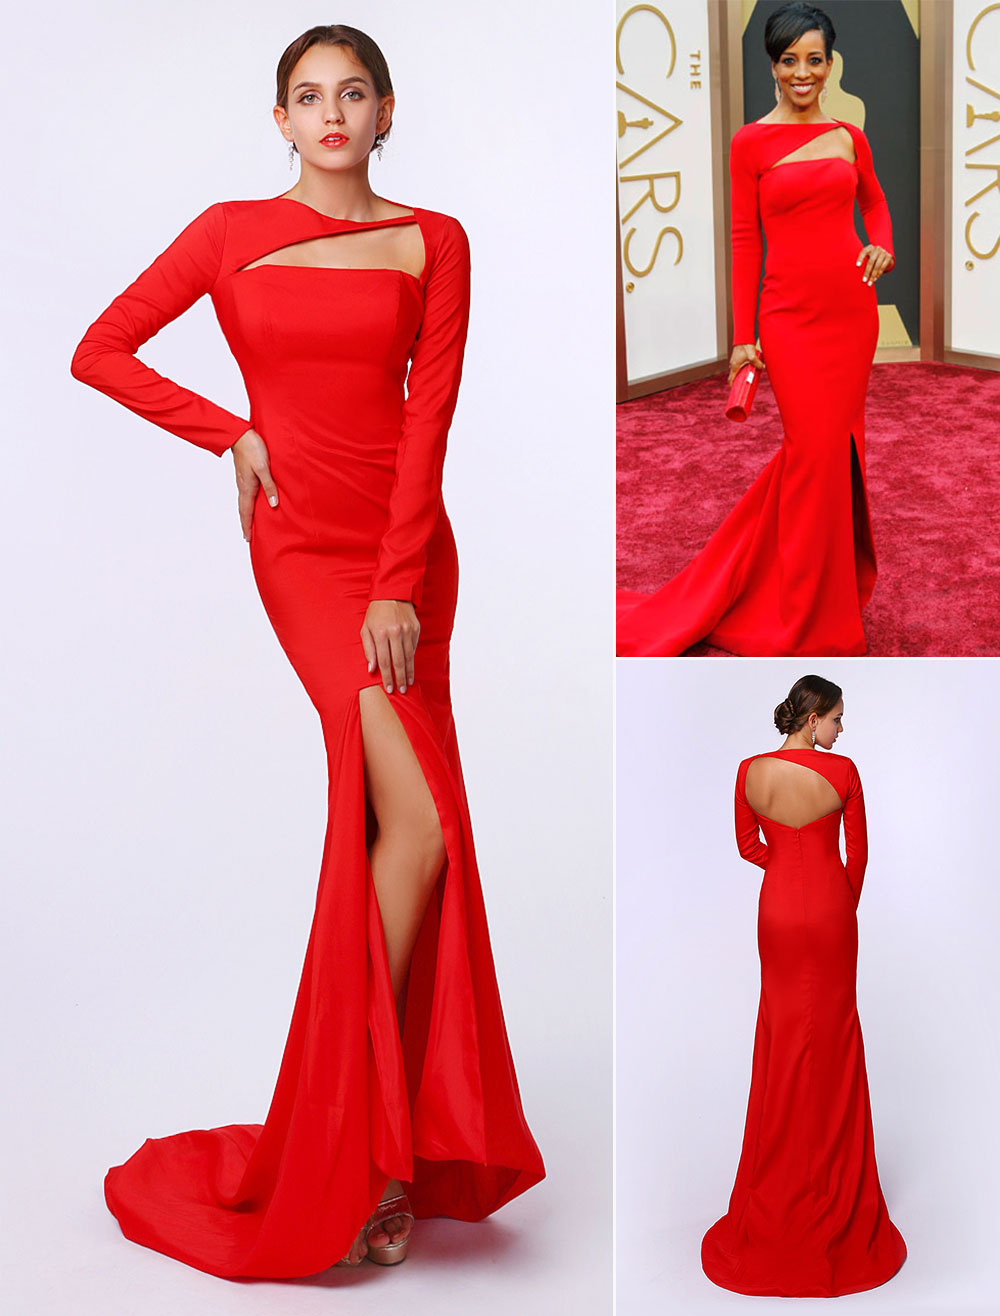 Mermaid Red Elastic Silk Split Sweep Train Evening Dress Inspired by Shaun Robinson at Oscar (Wedding Oscar Dresses) photo